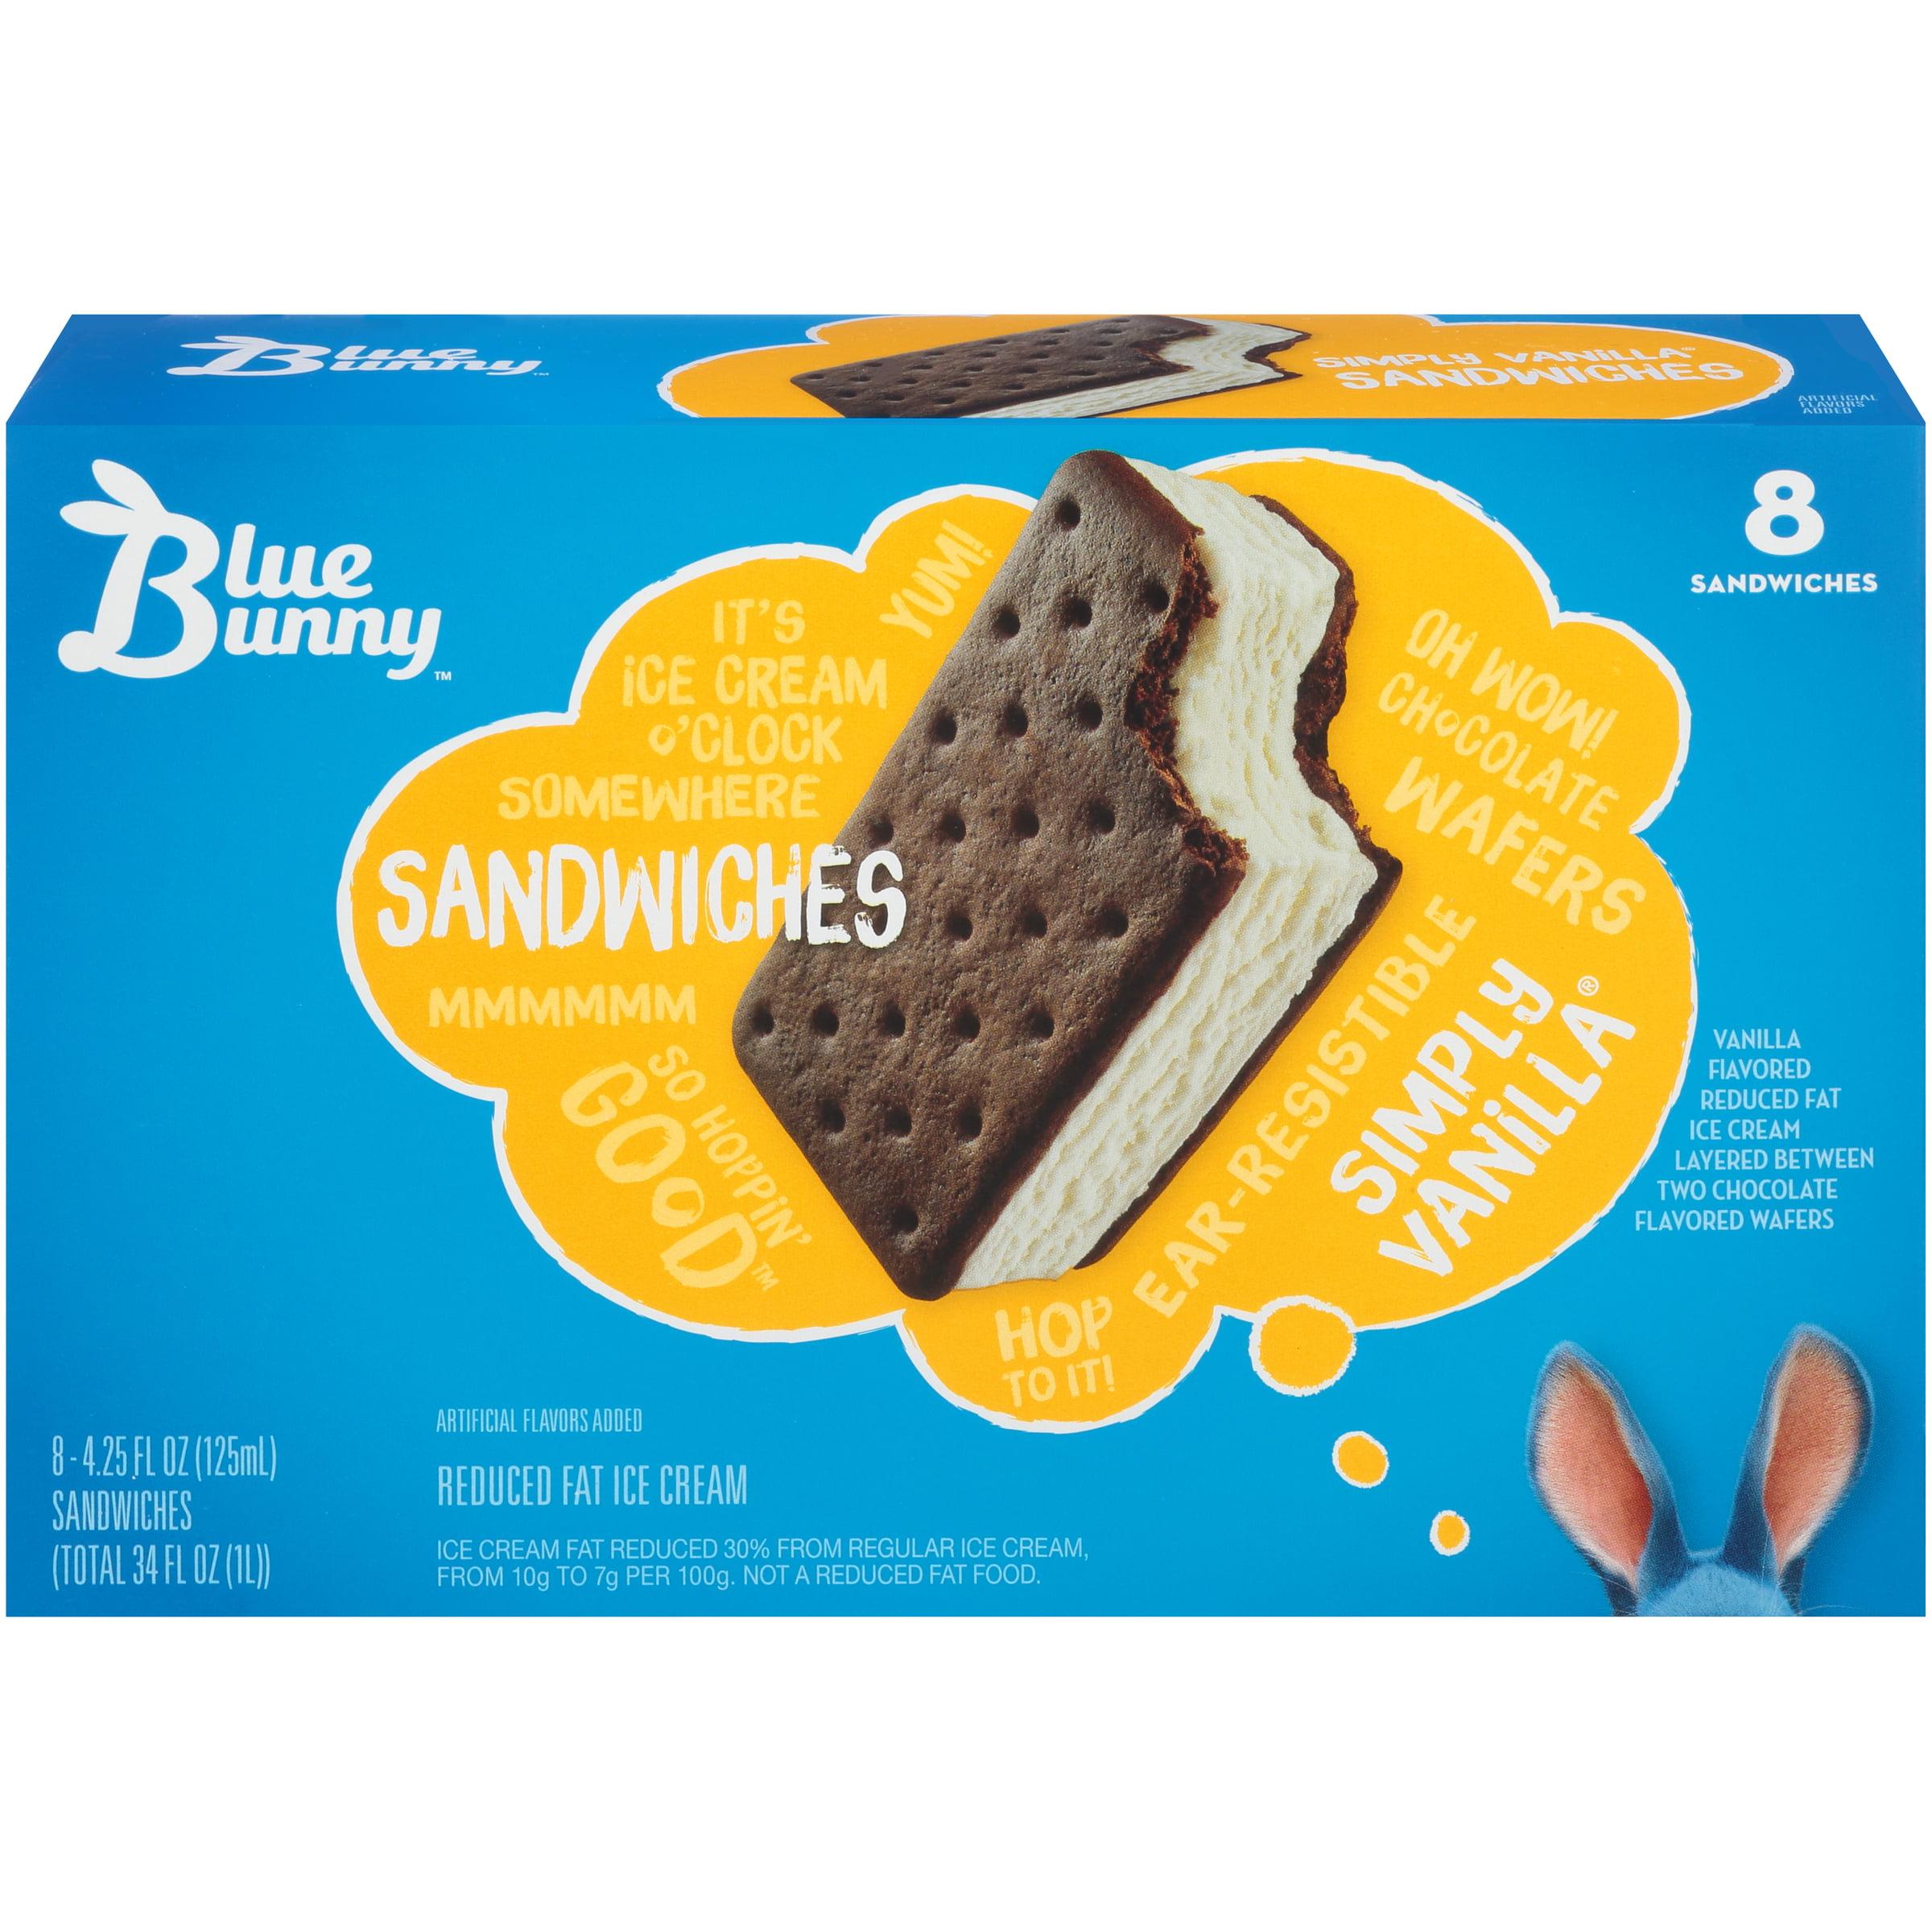 Swell Blue Bunny Simply Vanilla Ice Cream Sandwich 8Pk Walmart Com Funny Birthday Cards Online Aeocydamsfinfo